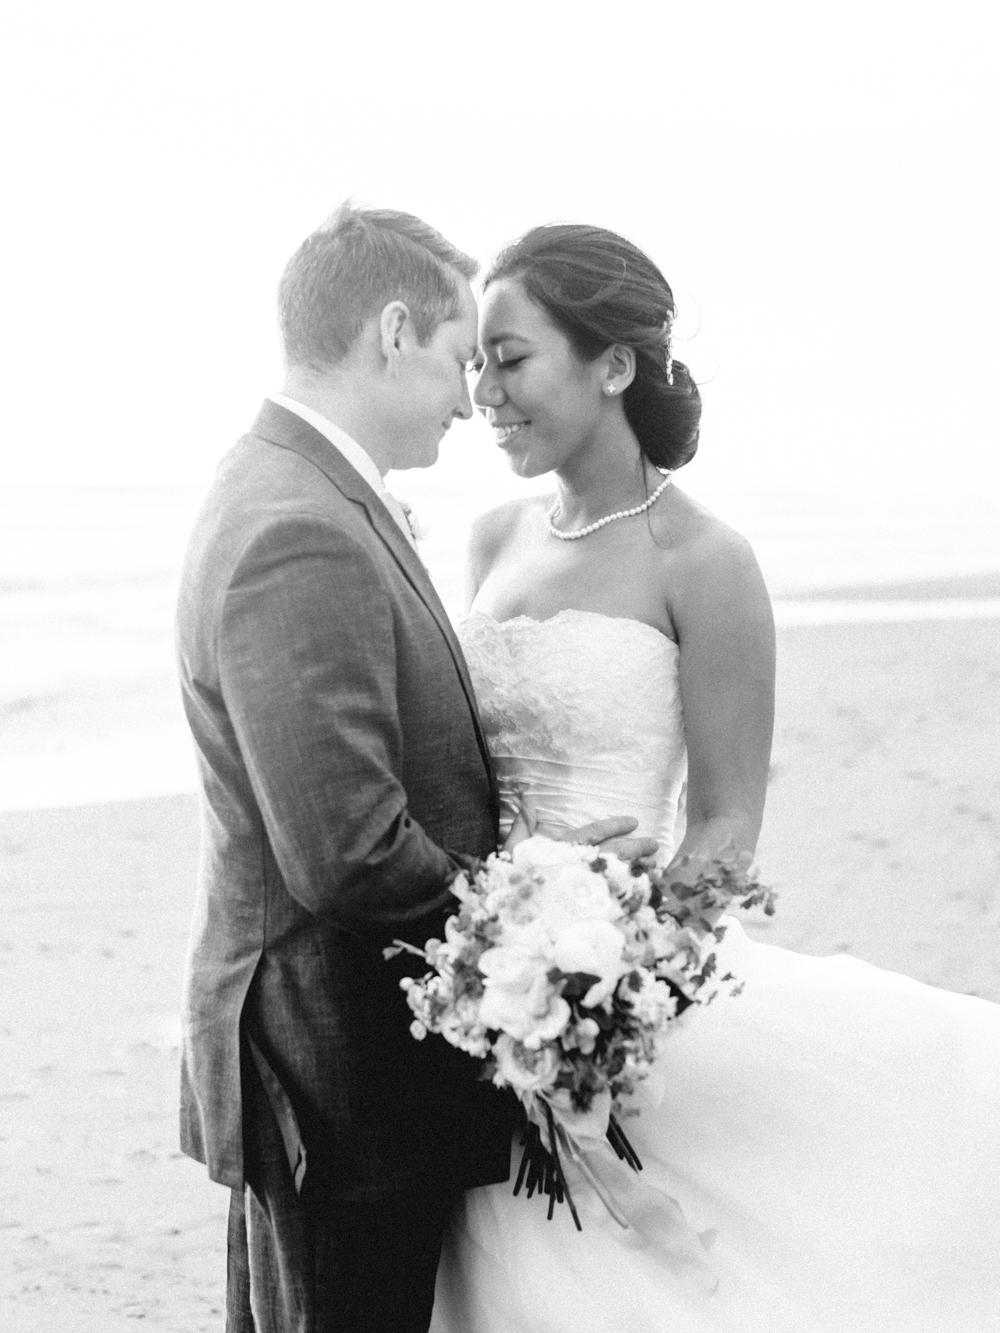 Bali_Real_Wedding_(c)_Rory_Wylie-111.jpg